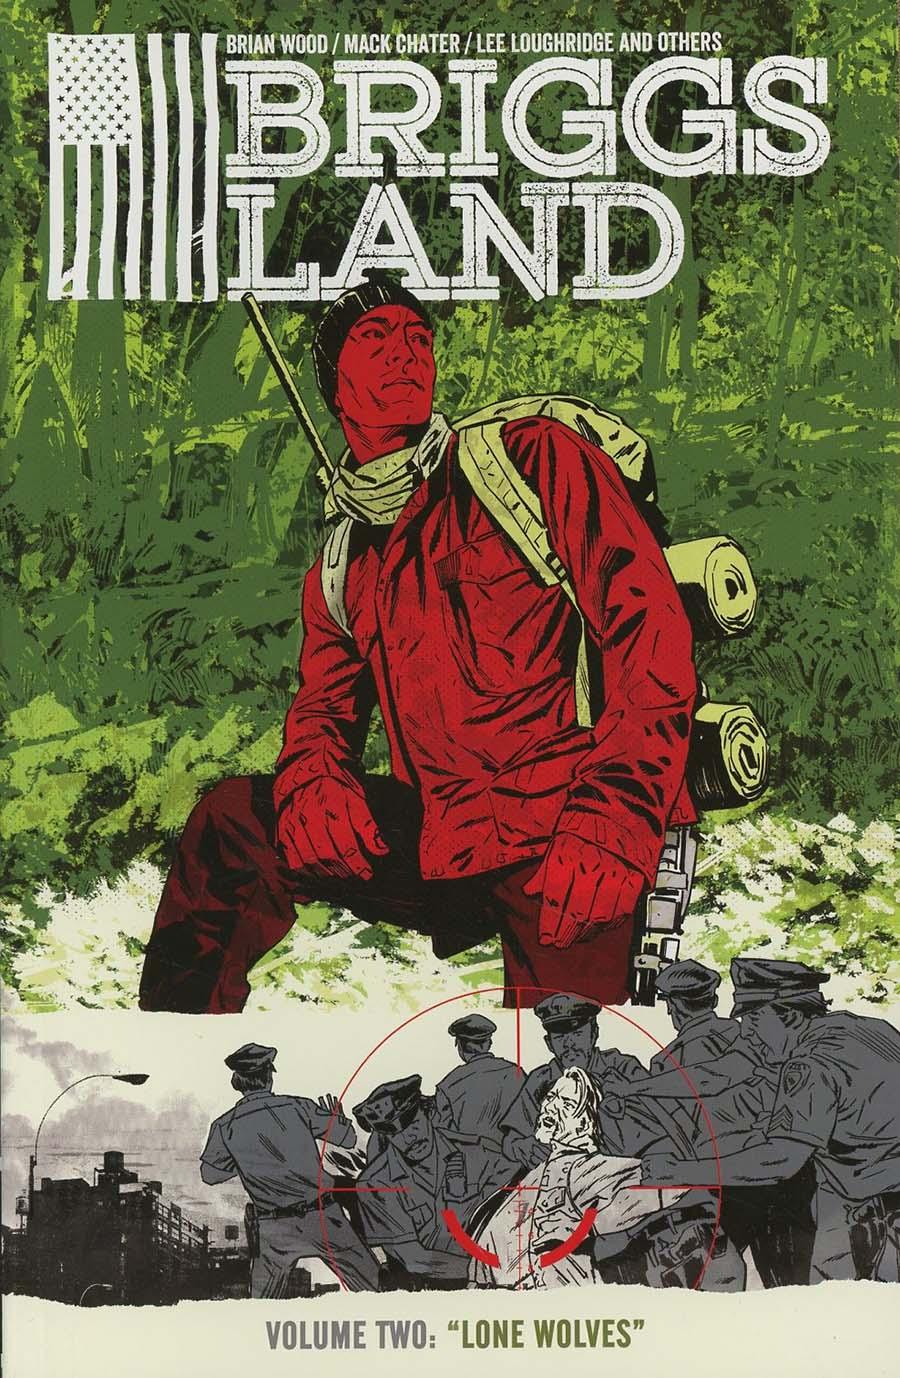 Briggs Land Vol 2 Lone Wolves TP